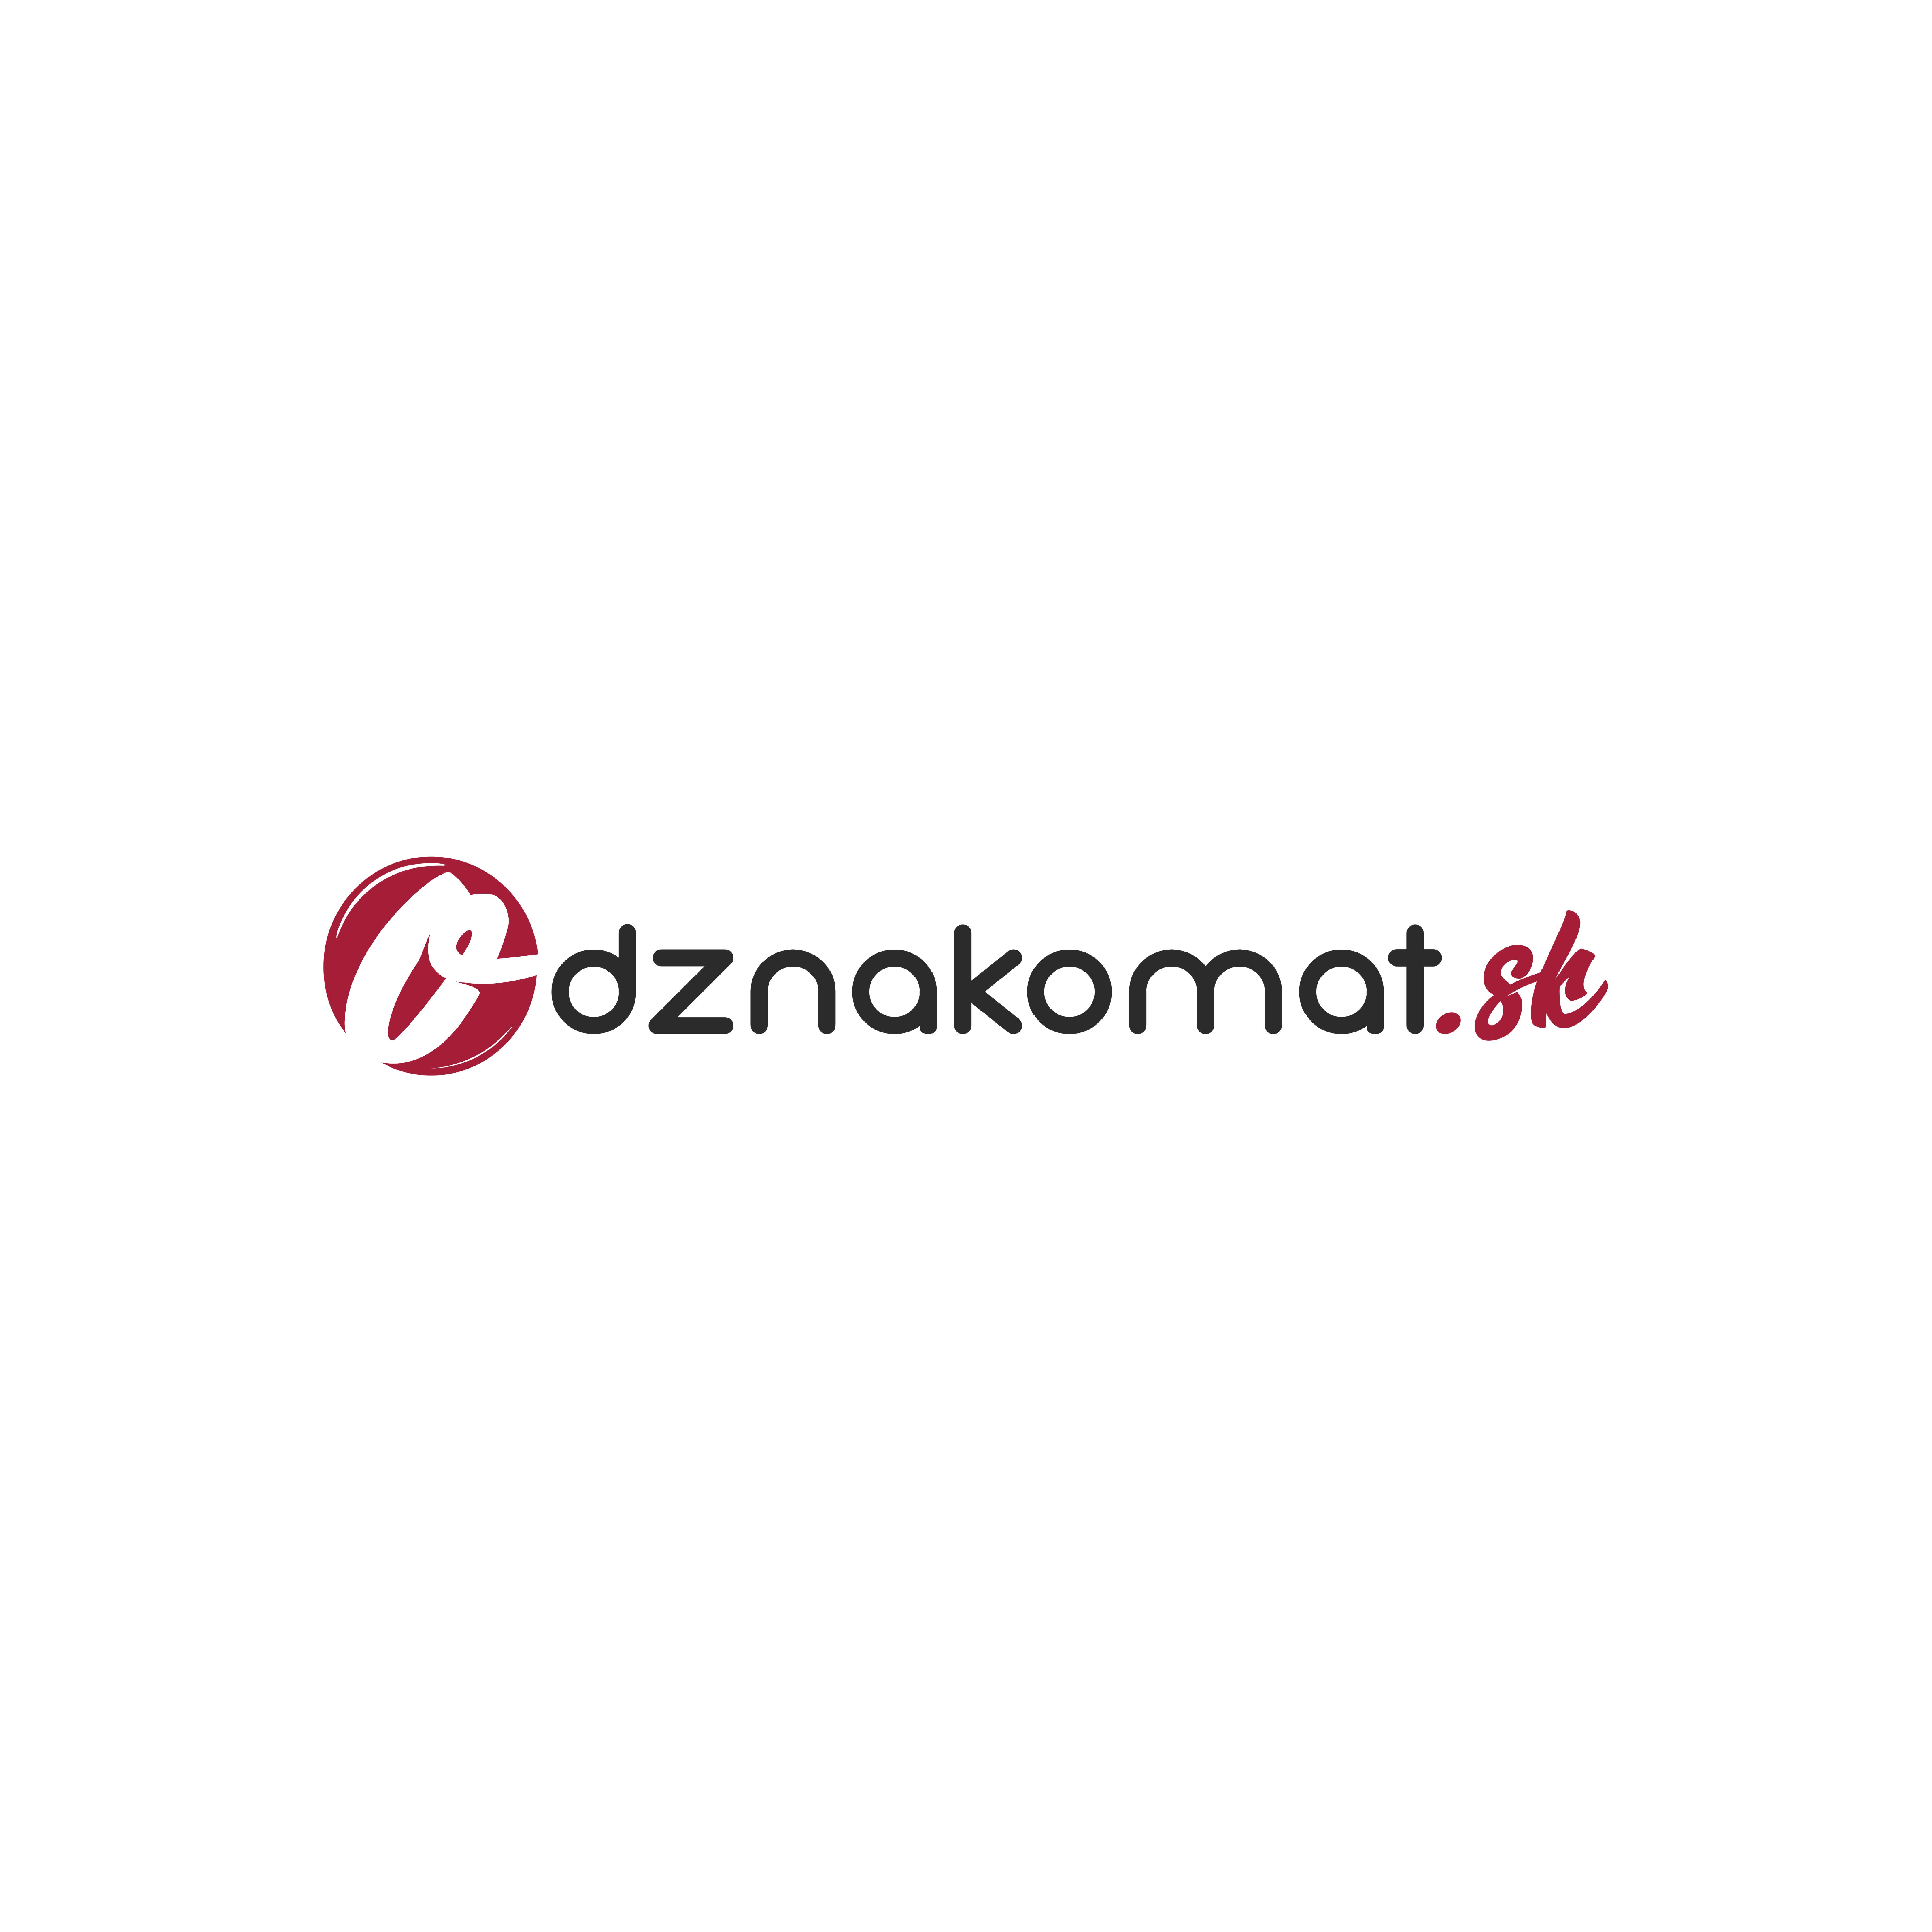 logo 10-01